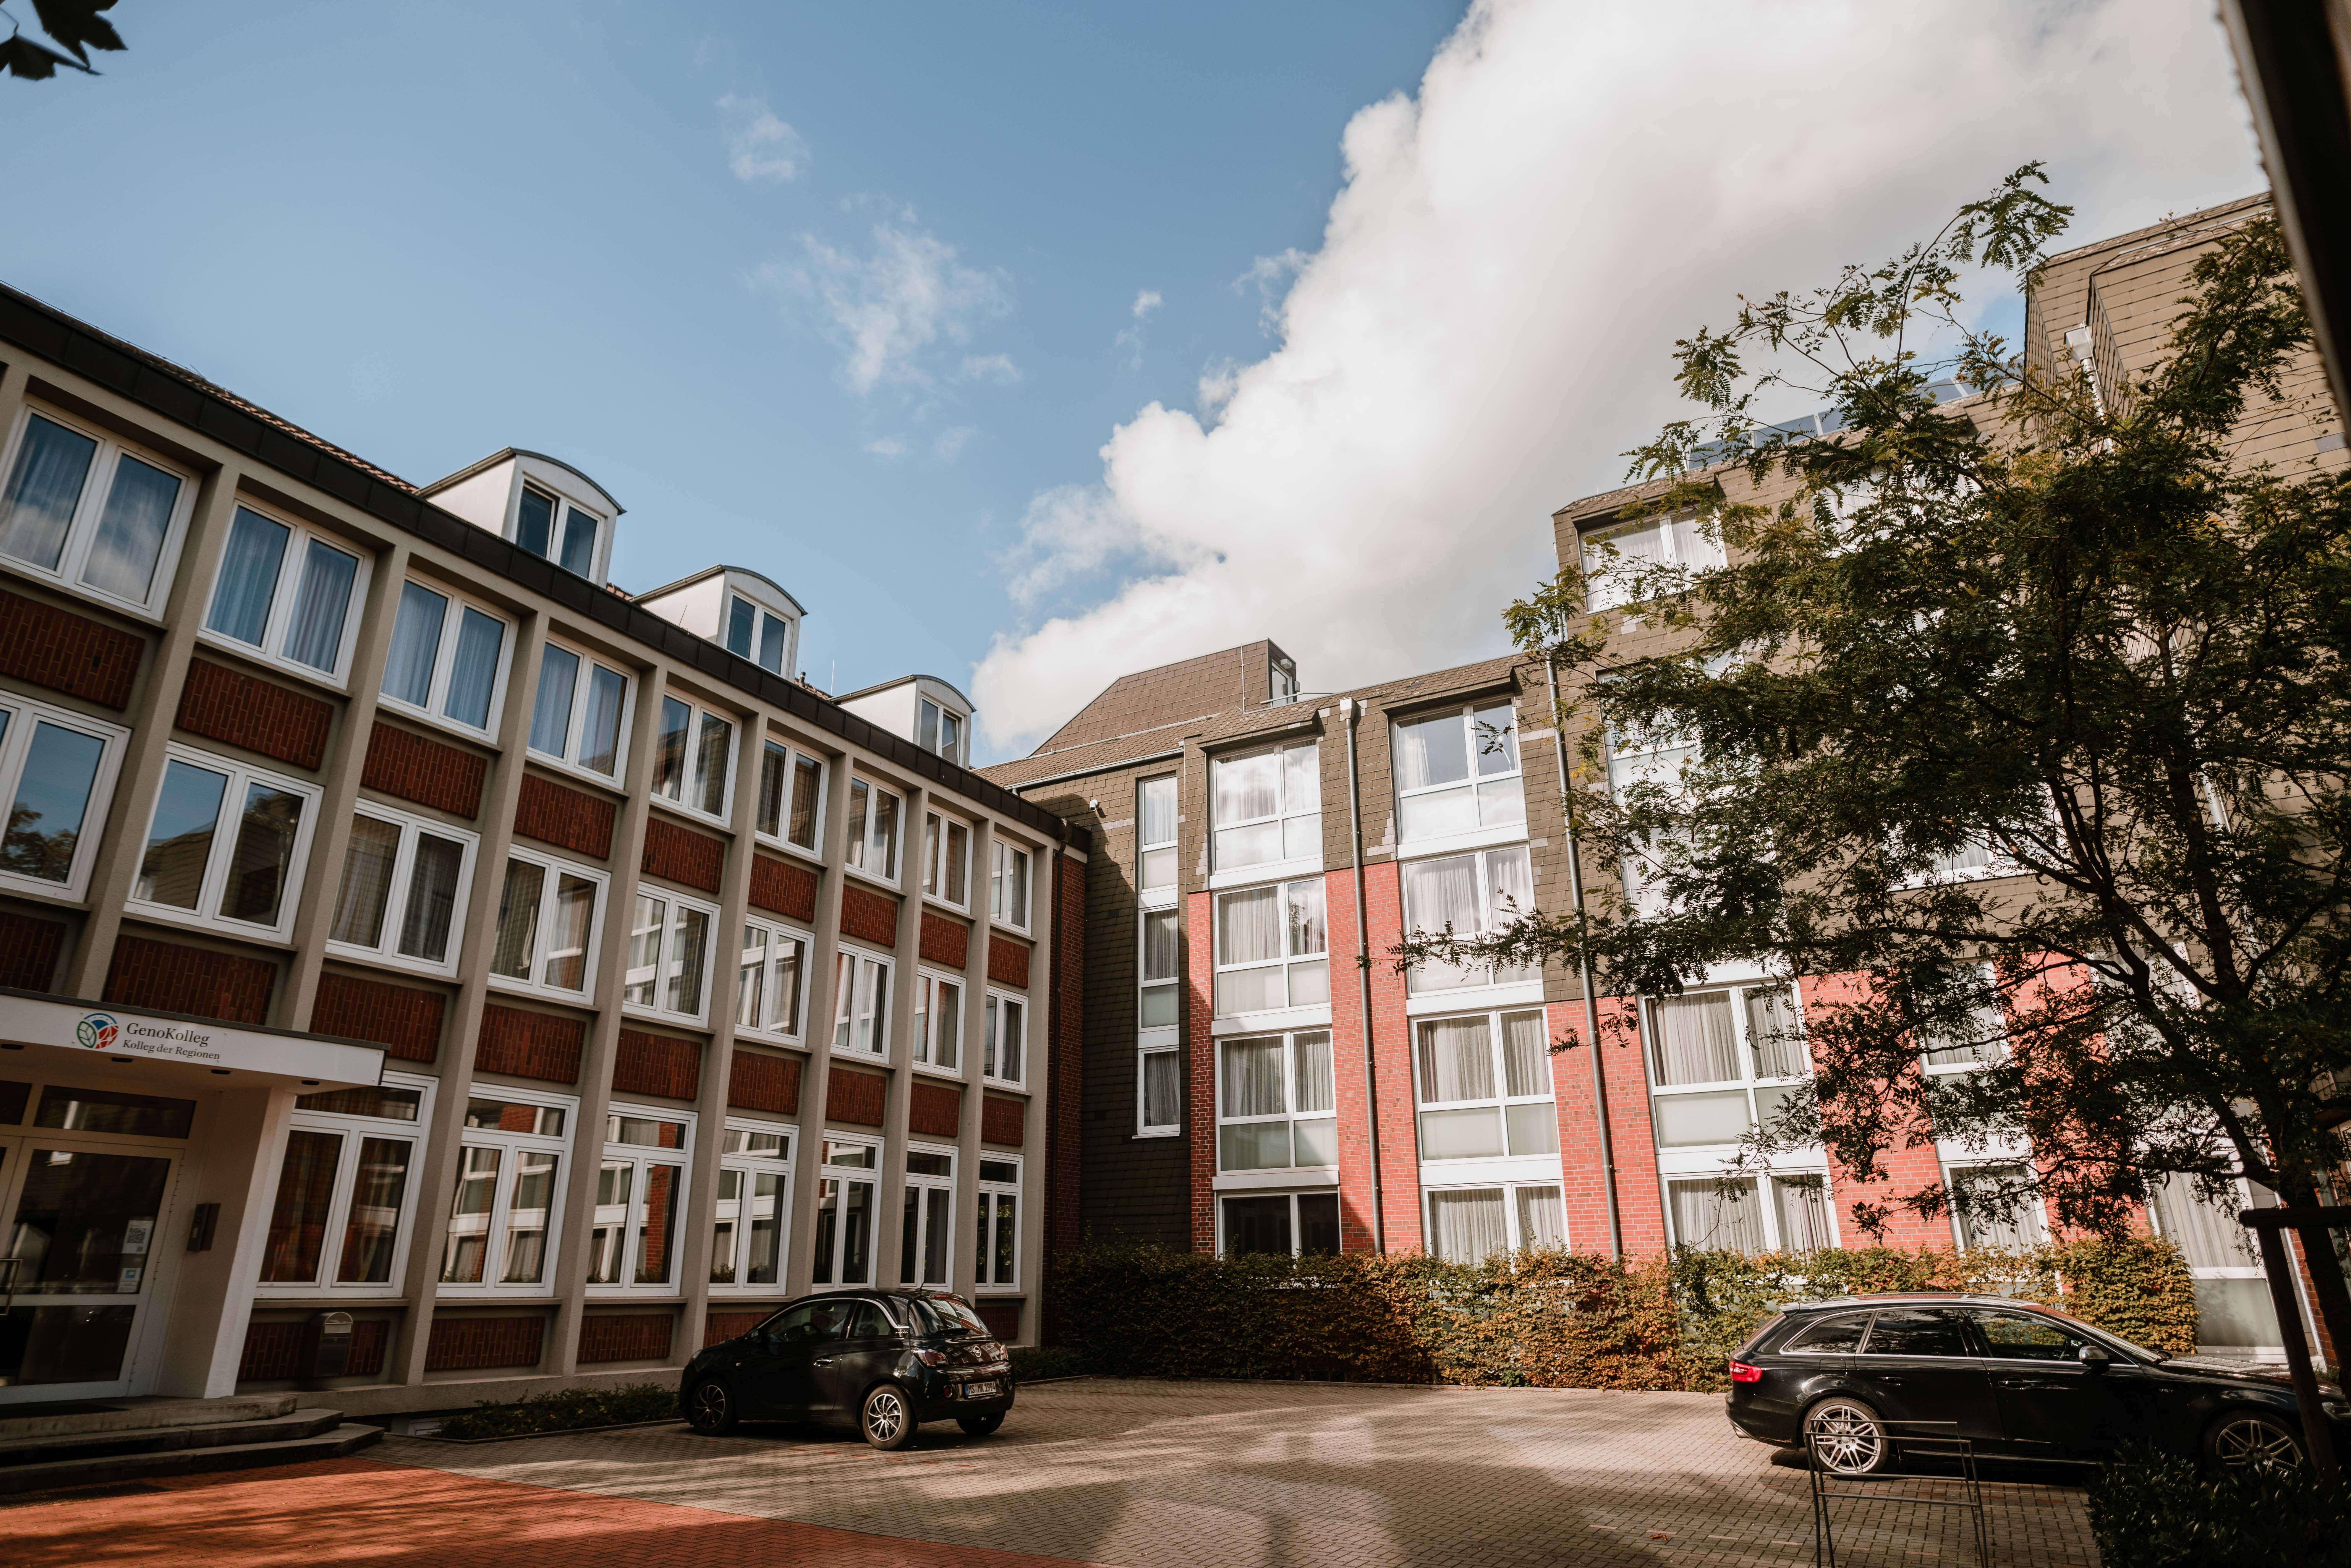 GenoKolleg Münster